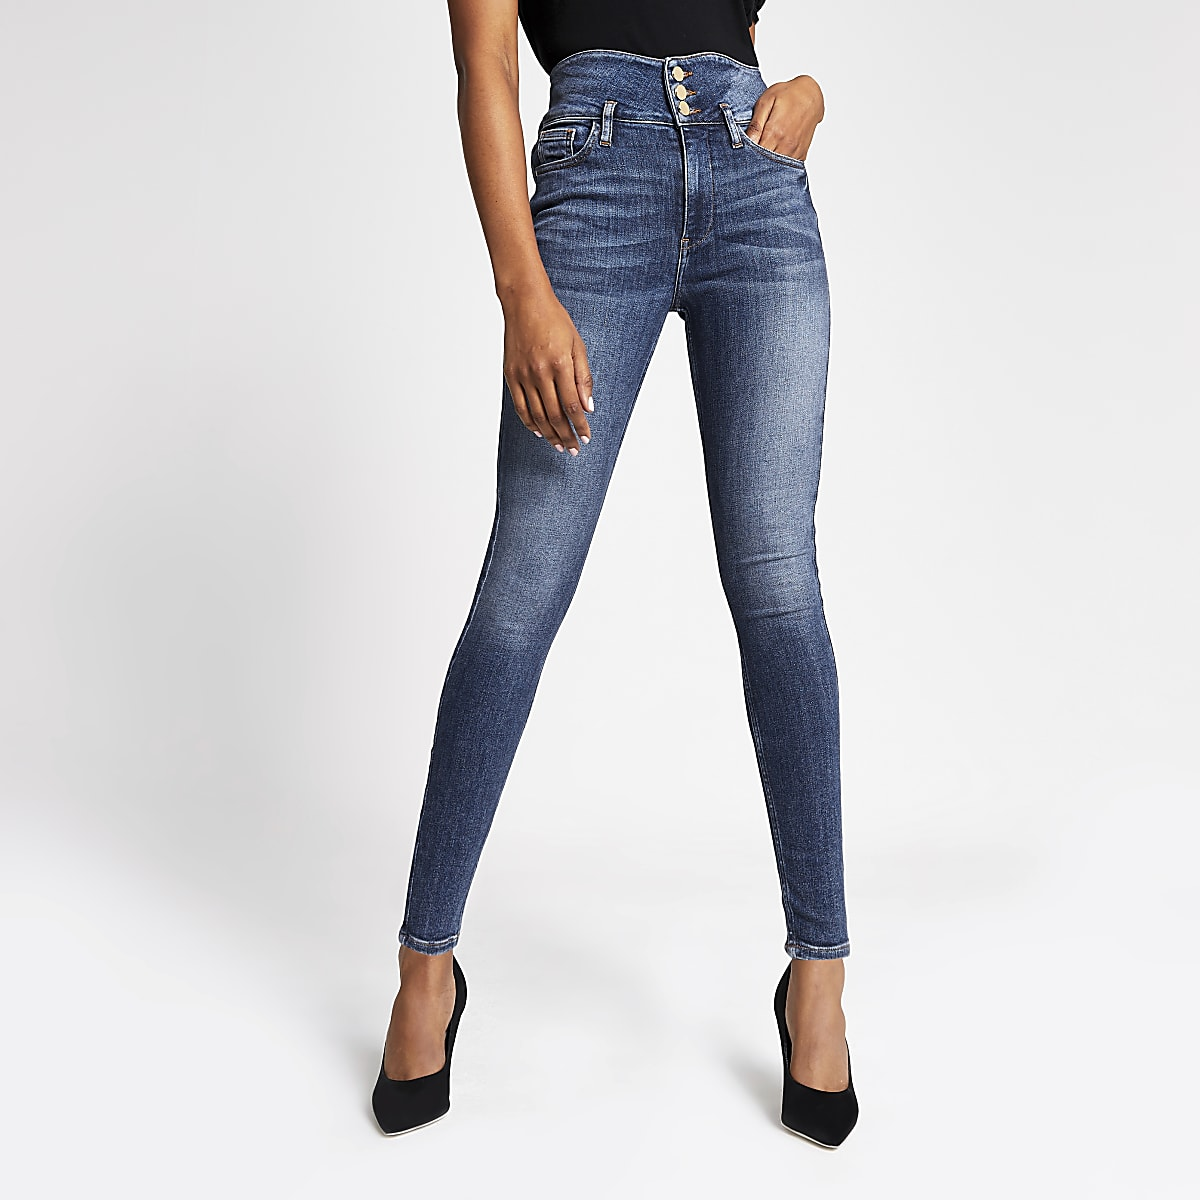 Hailey - Middenblauwe denim jeans met hoge taille